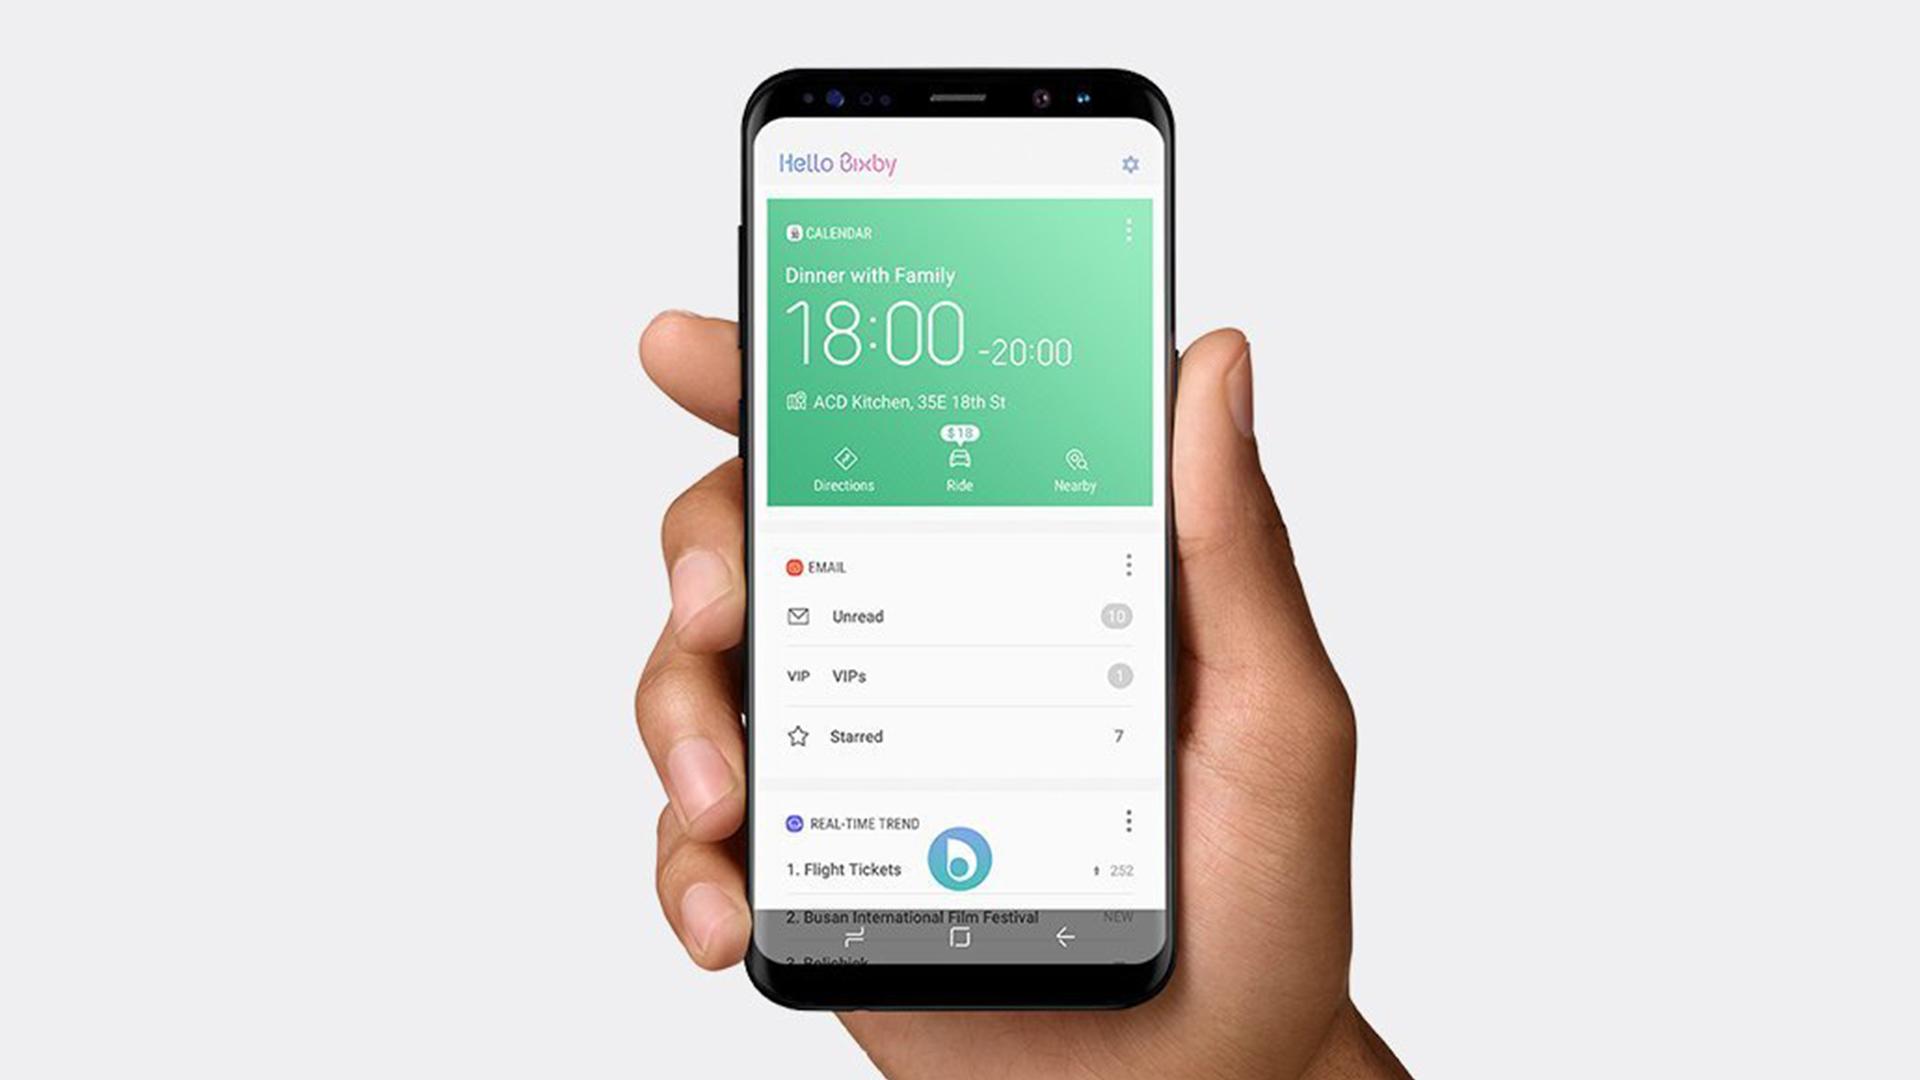 Samsung Galaxy Note 8-159532.jpg83975968